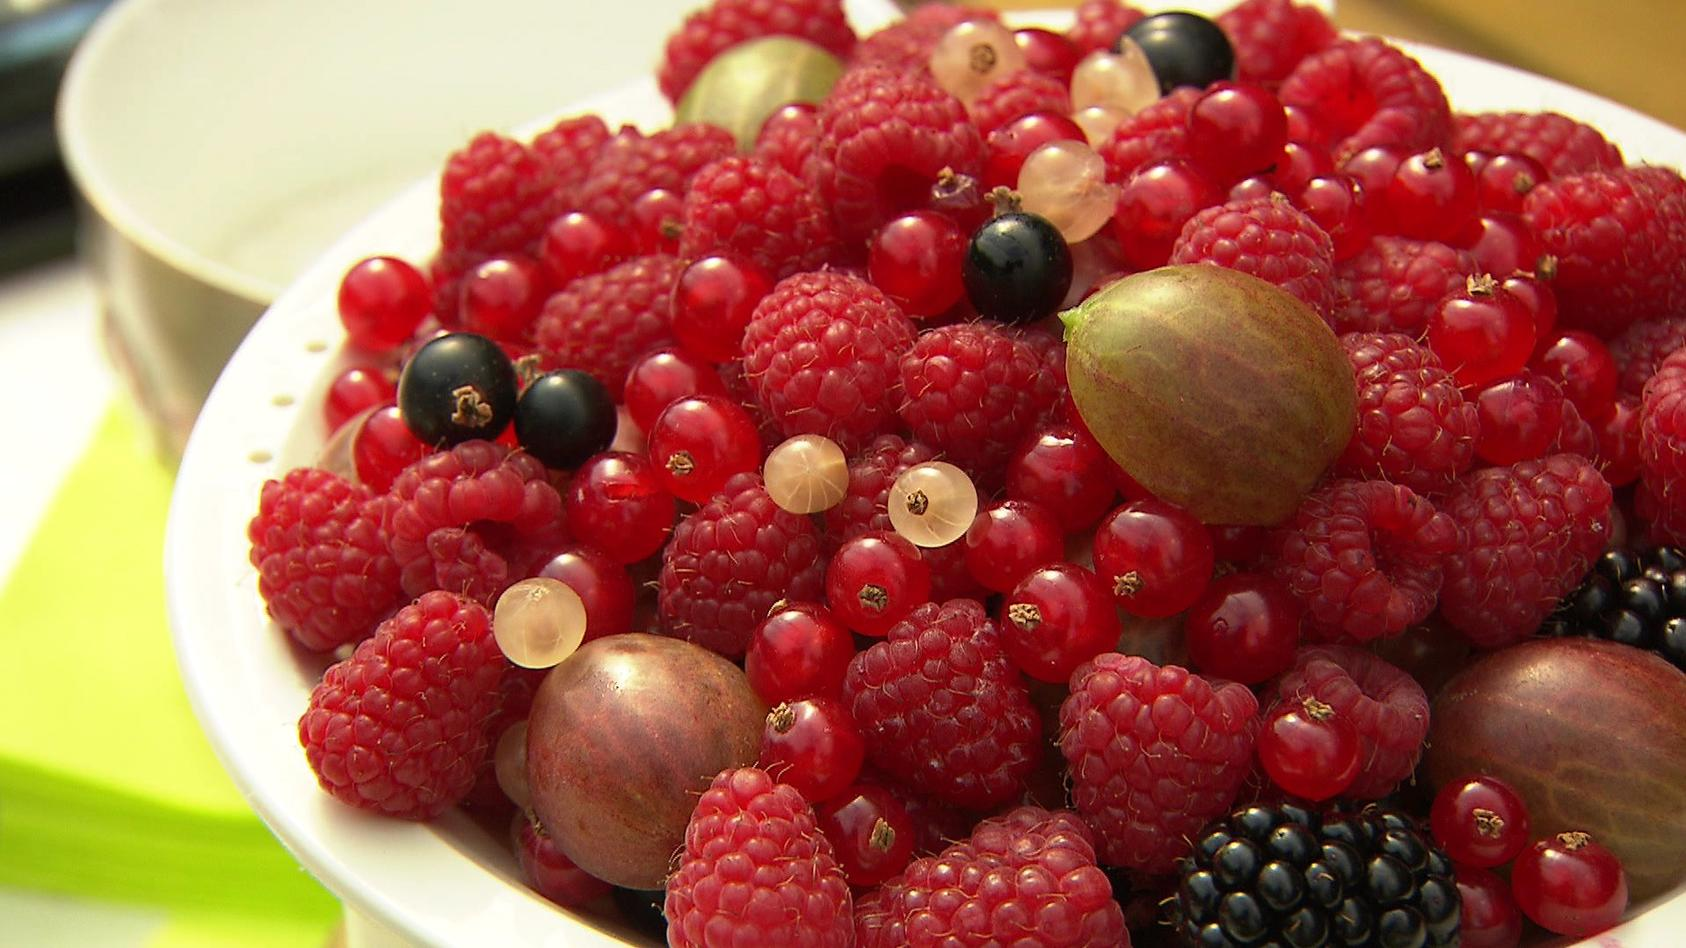 Mit Himbeeren, Brombeeren, Stachelbeeren und Johannisbeeren lassen sich süße, vitaminreiche Leckereien zaubern.